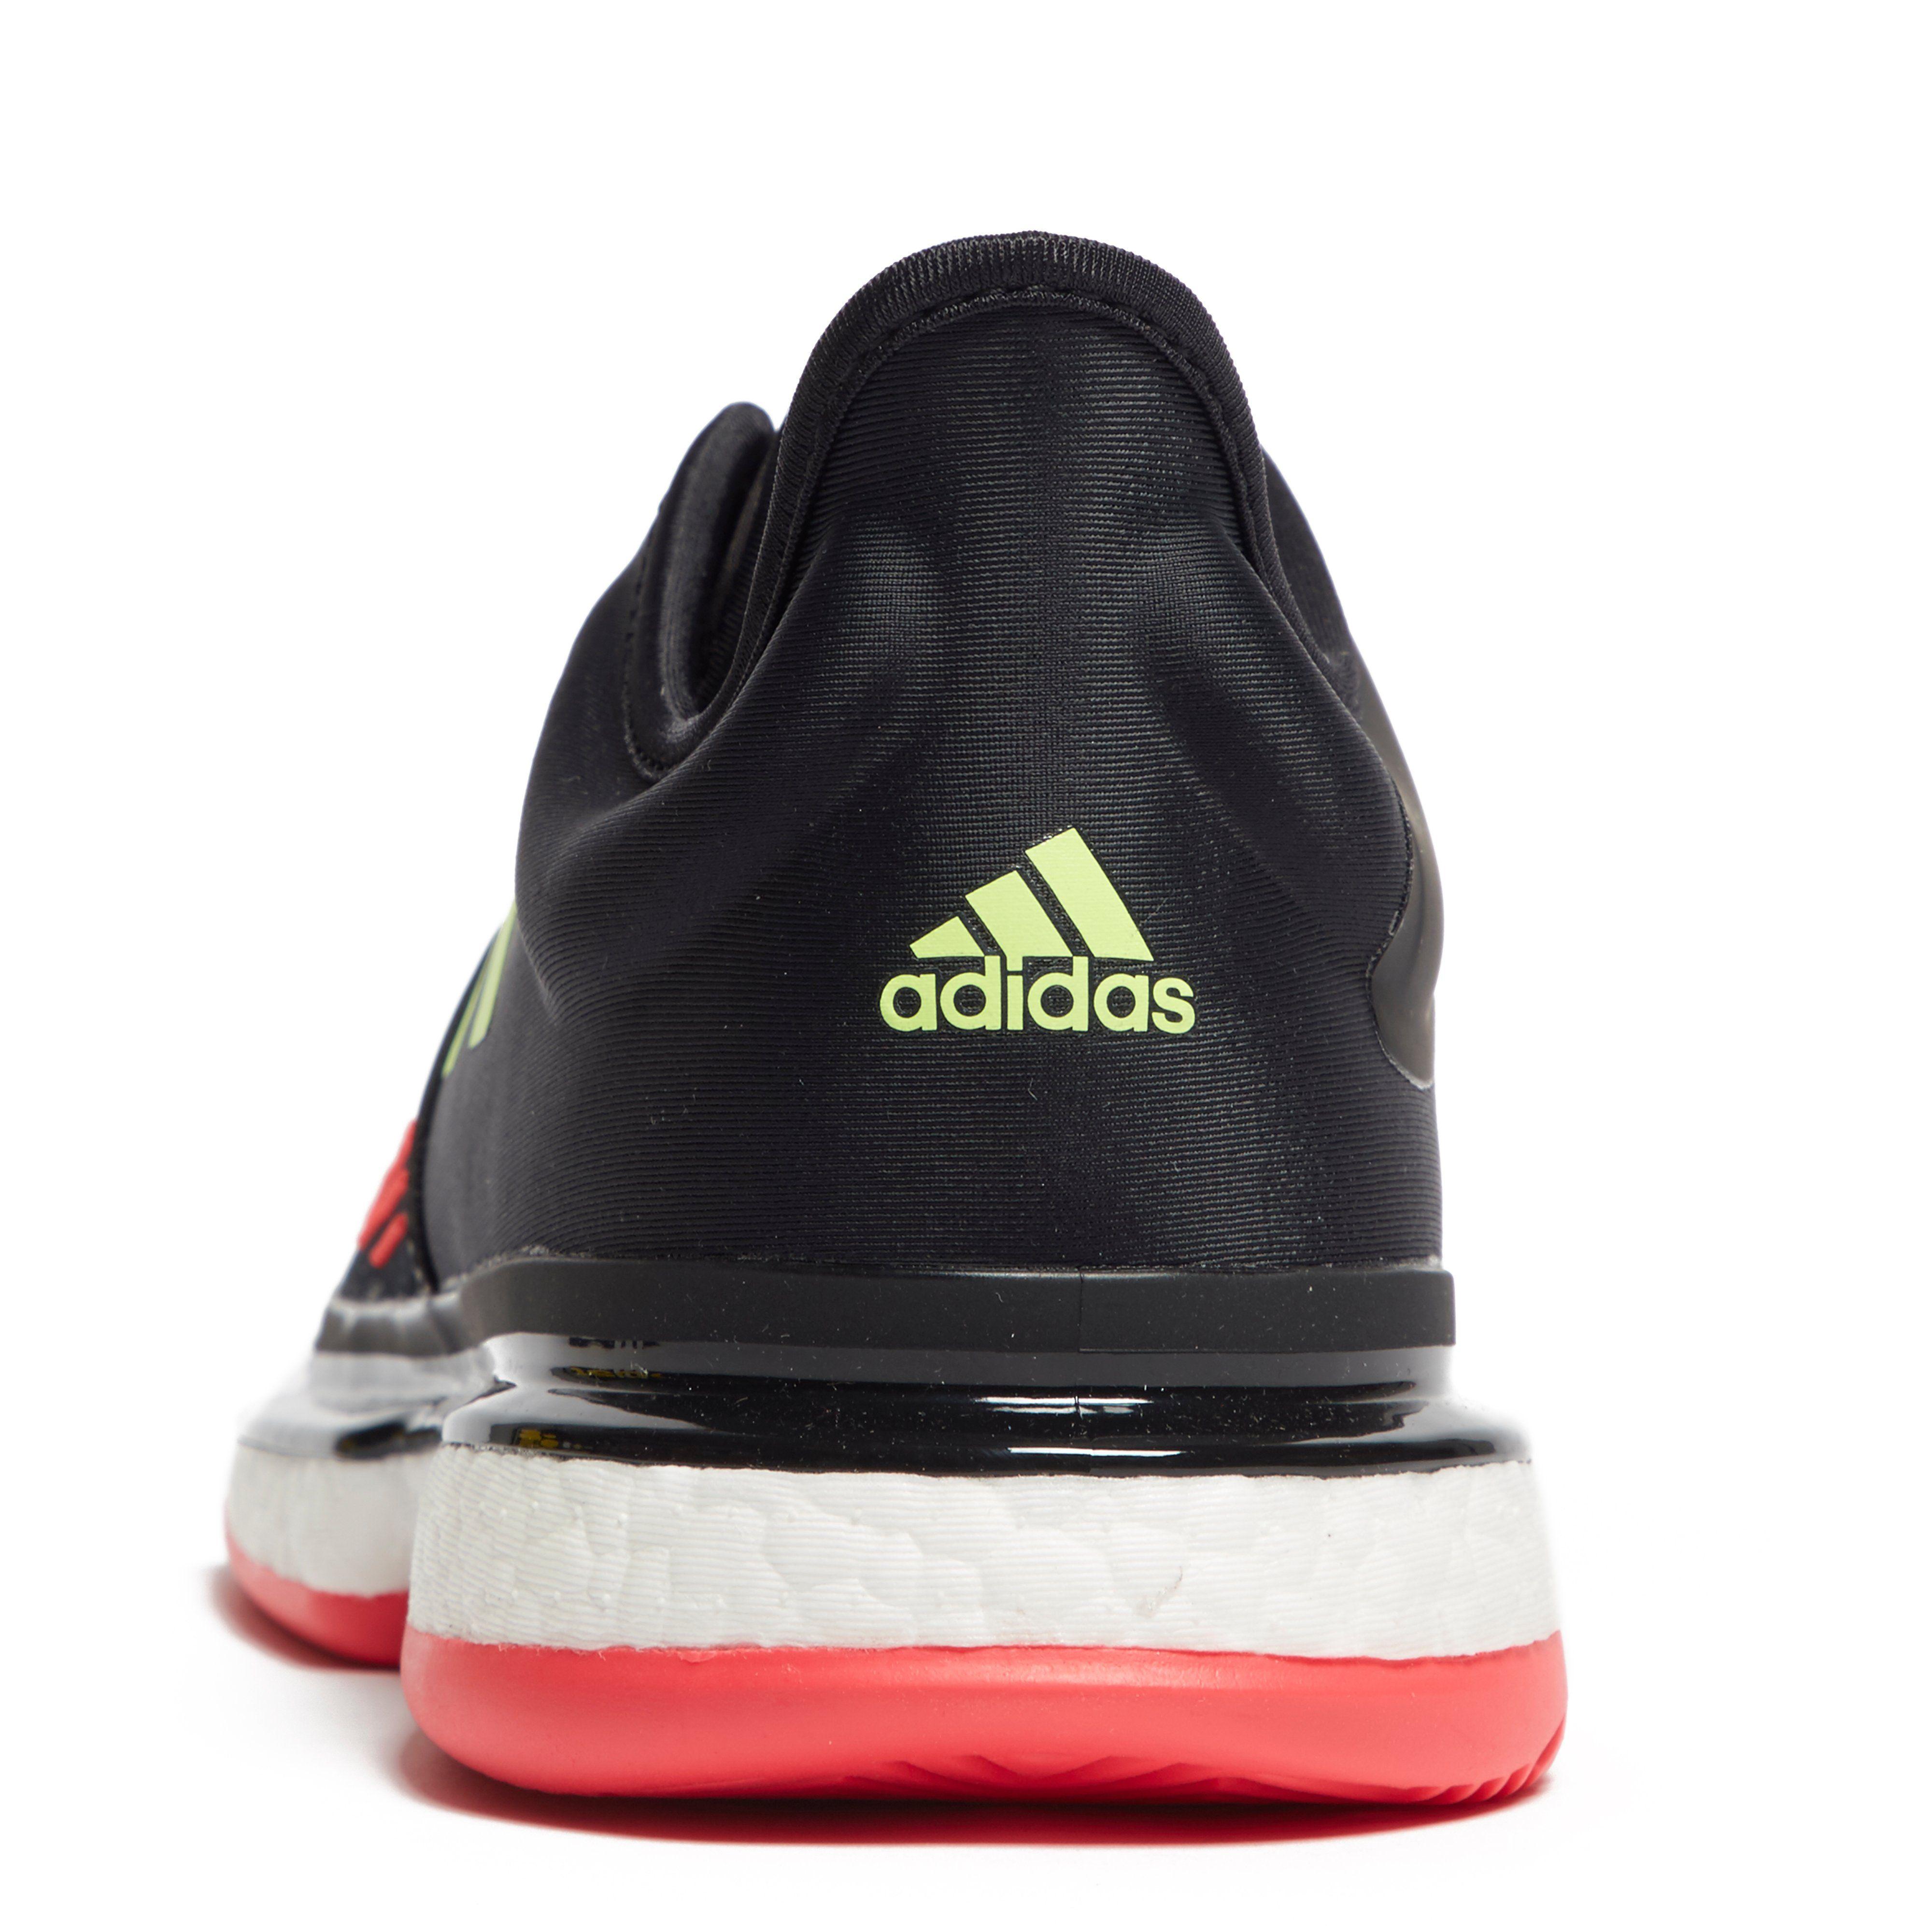 adidas Solecourt Boost Men's Tennis Shoes